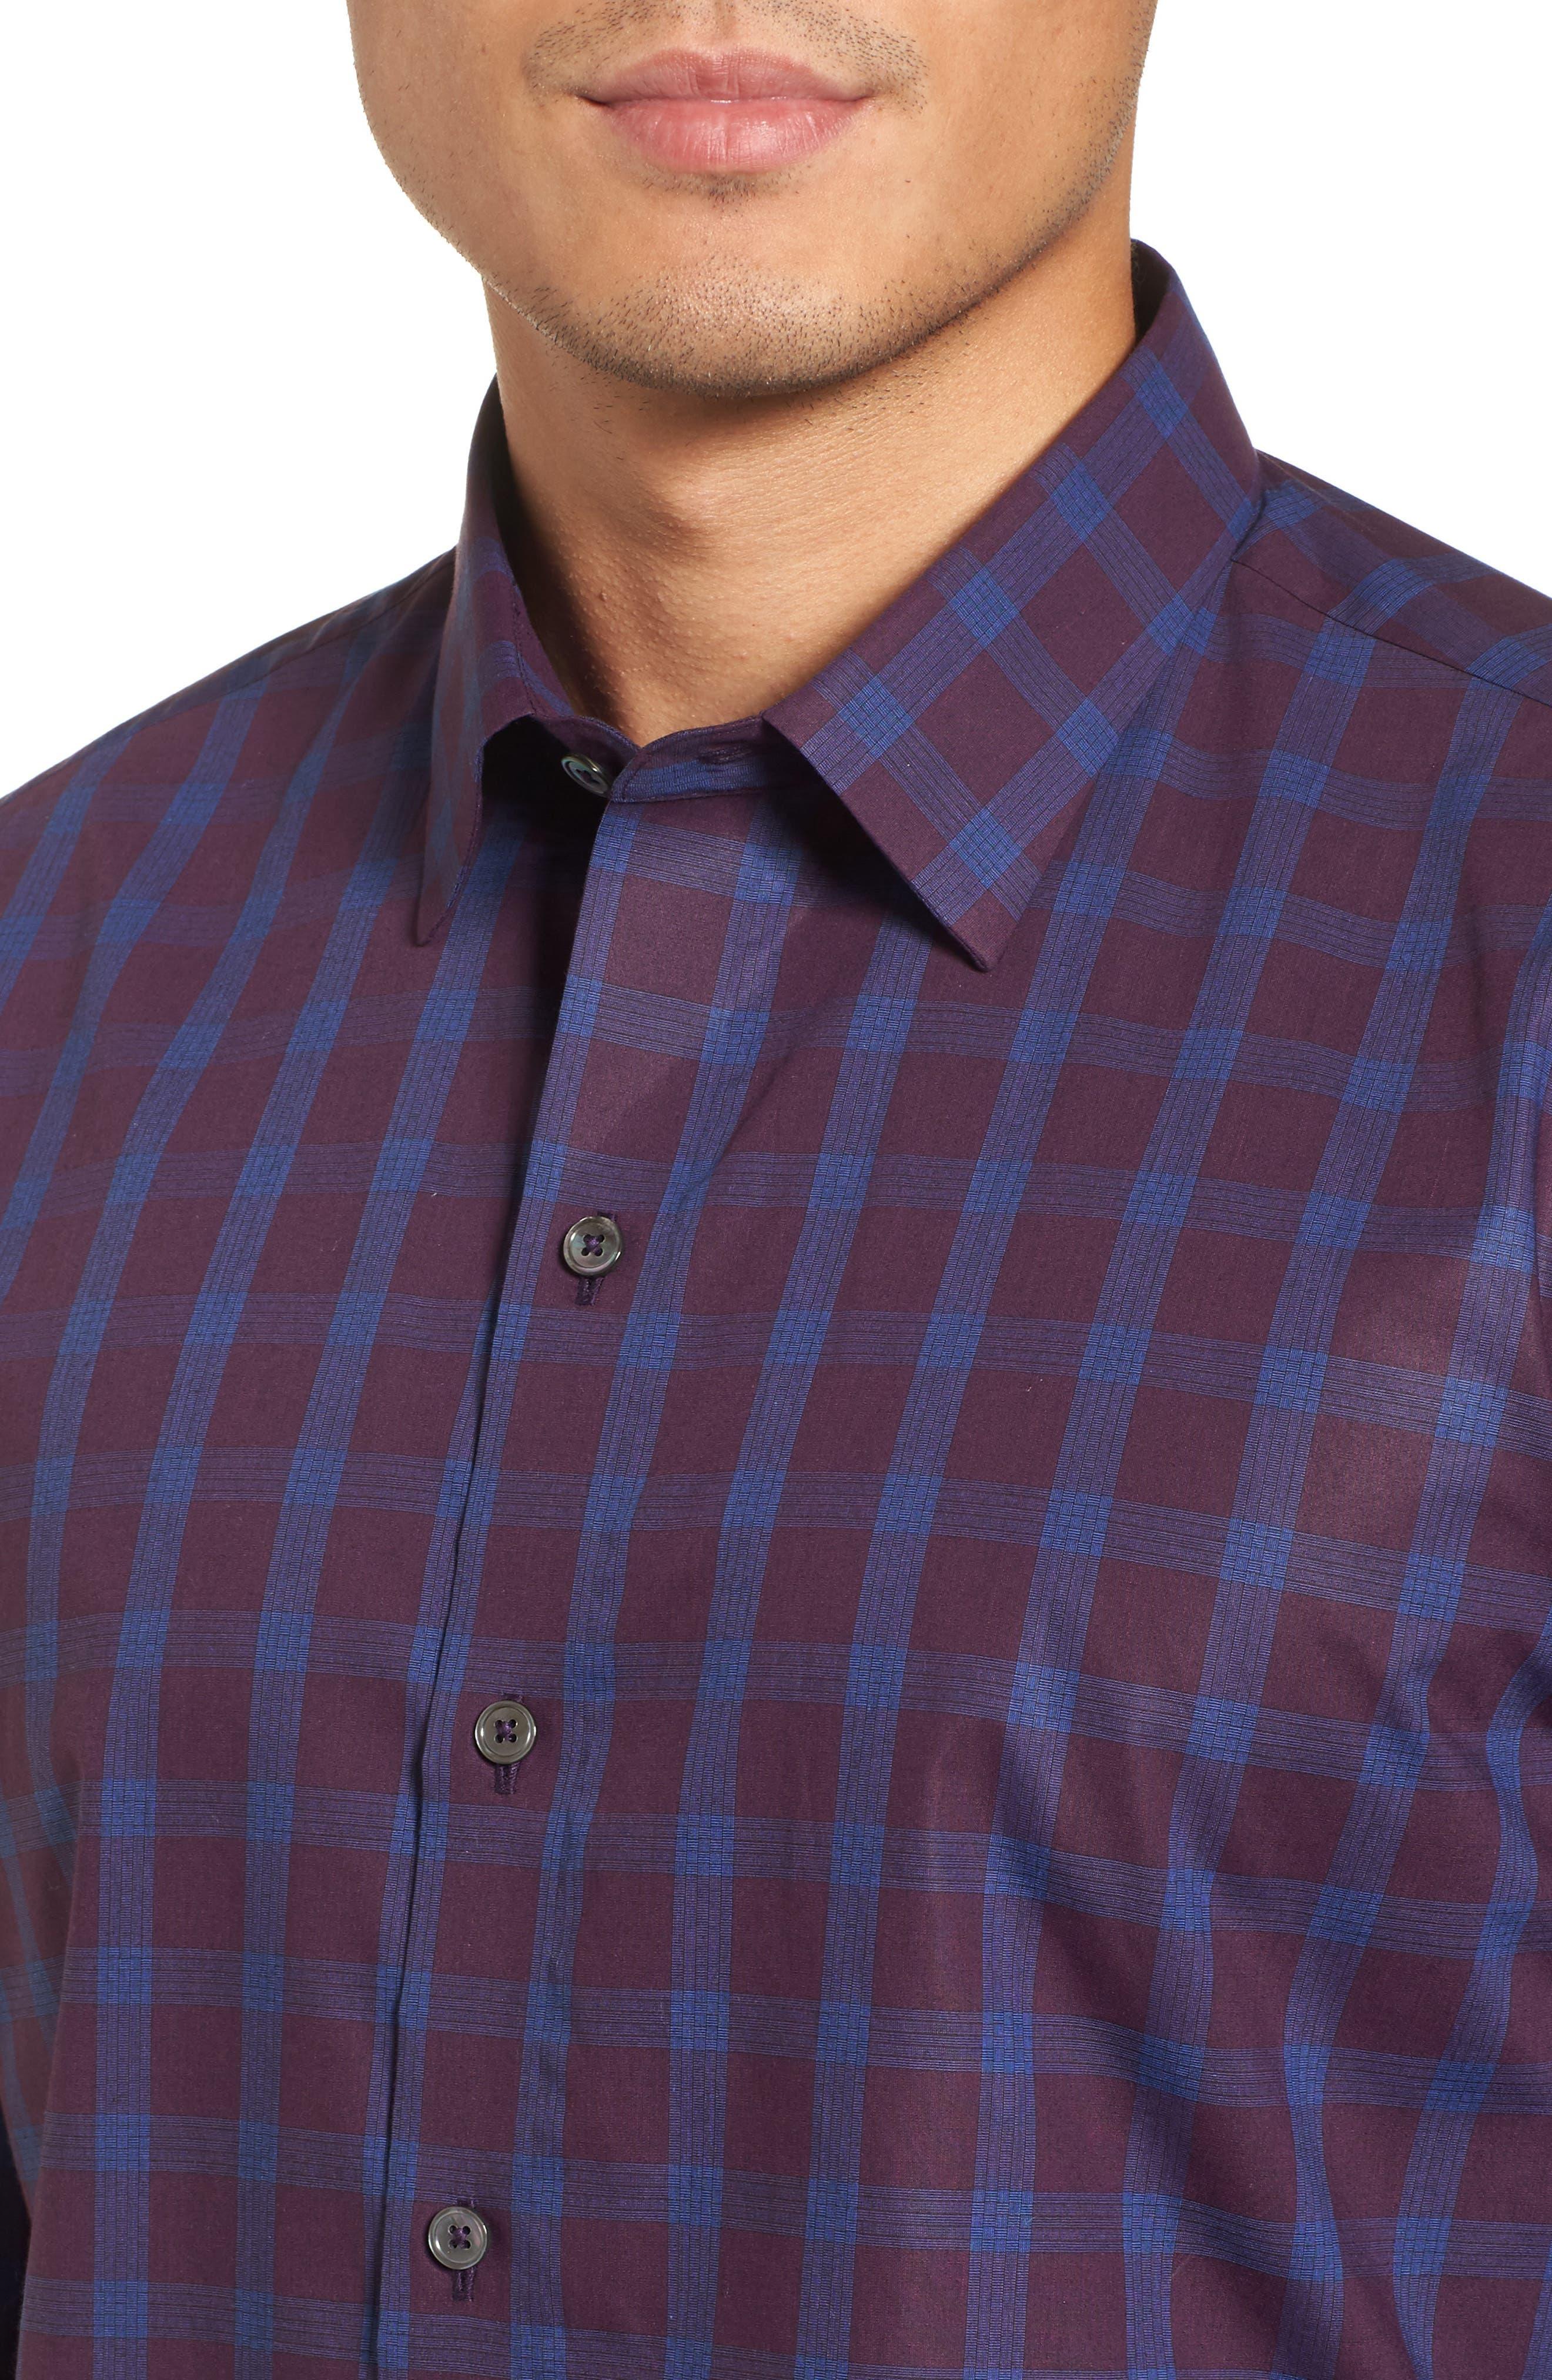 Raymond Check Sport Shirt,                             Alternate thumbnail 4, color,                             930